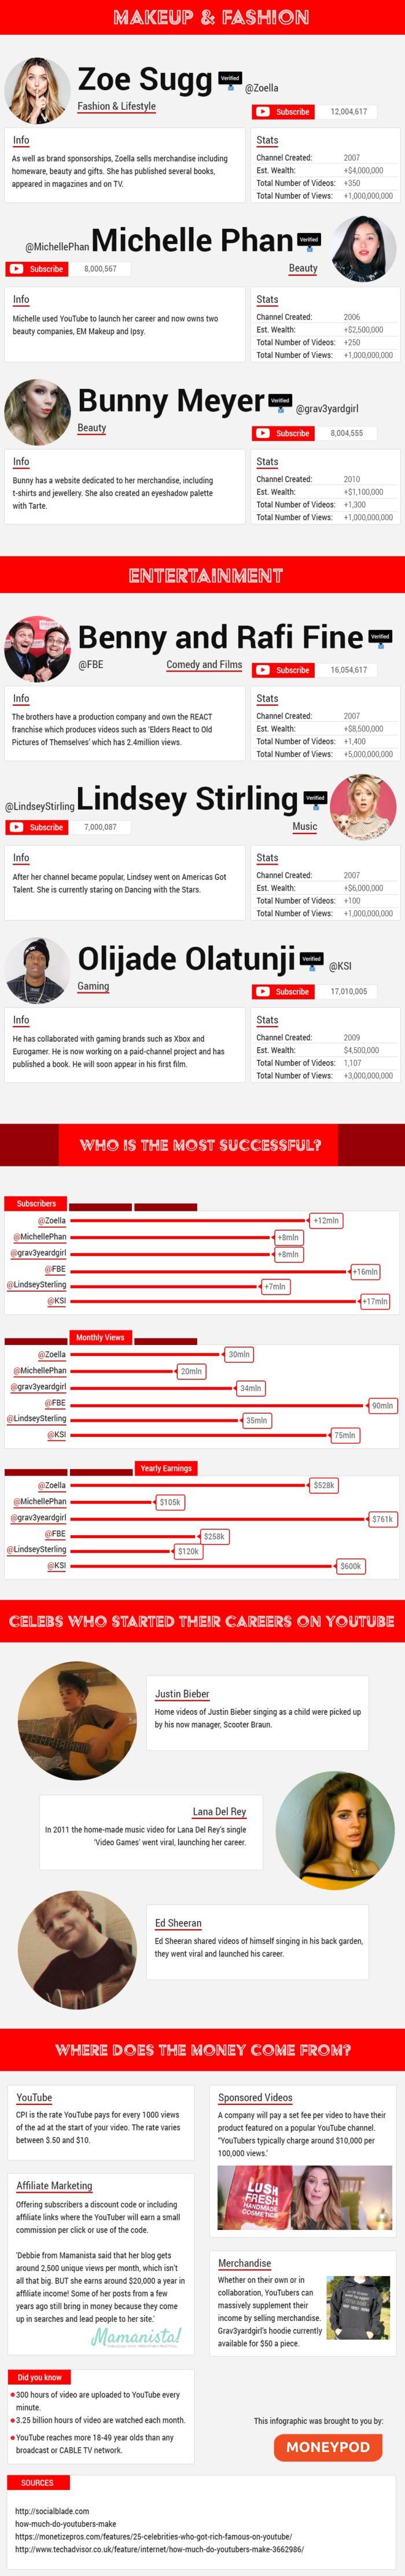 YouTube Stars Infographic